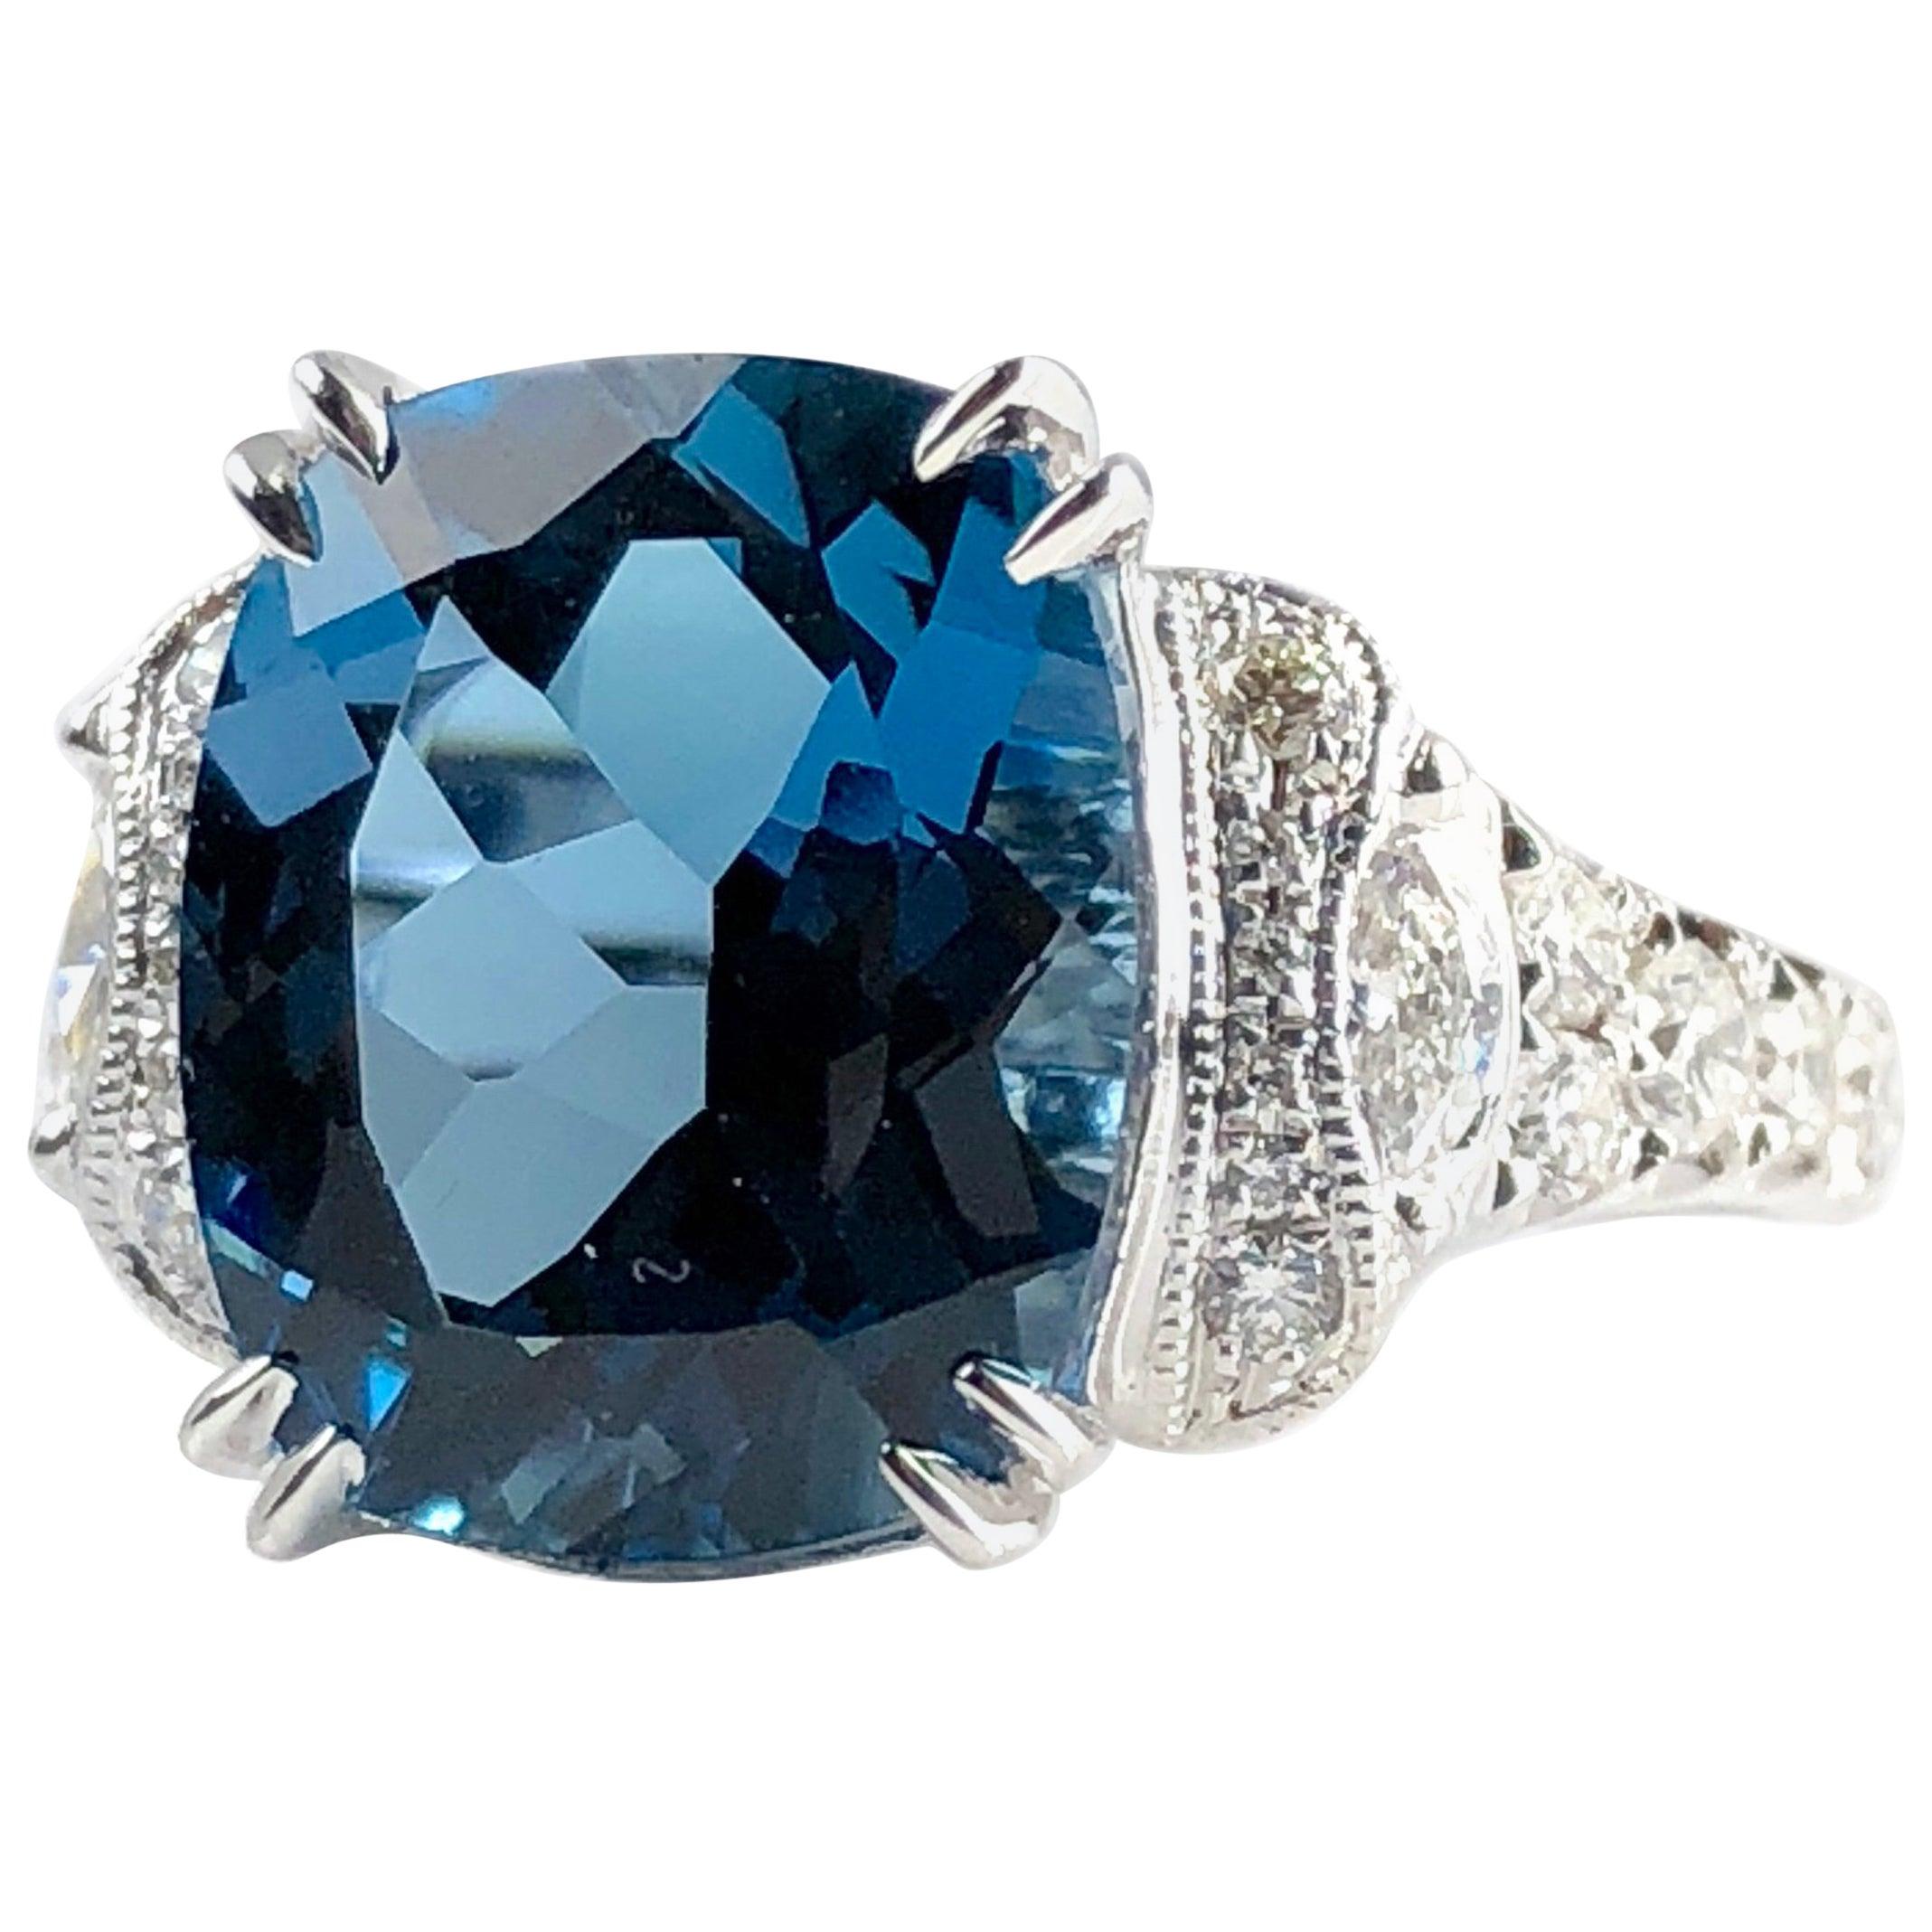 5 79 Carat Cushion Cut London Blue Topaz And 0 52 Carat Diamond Cocktail Ring